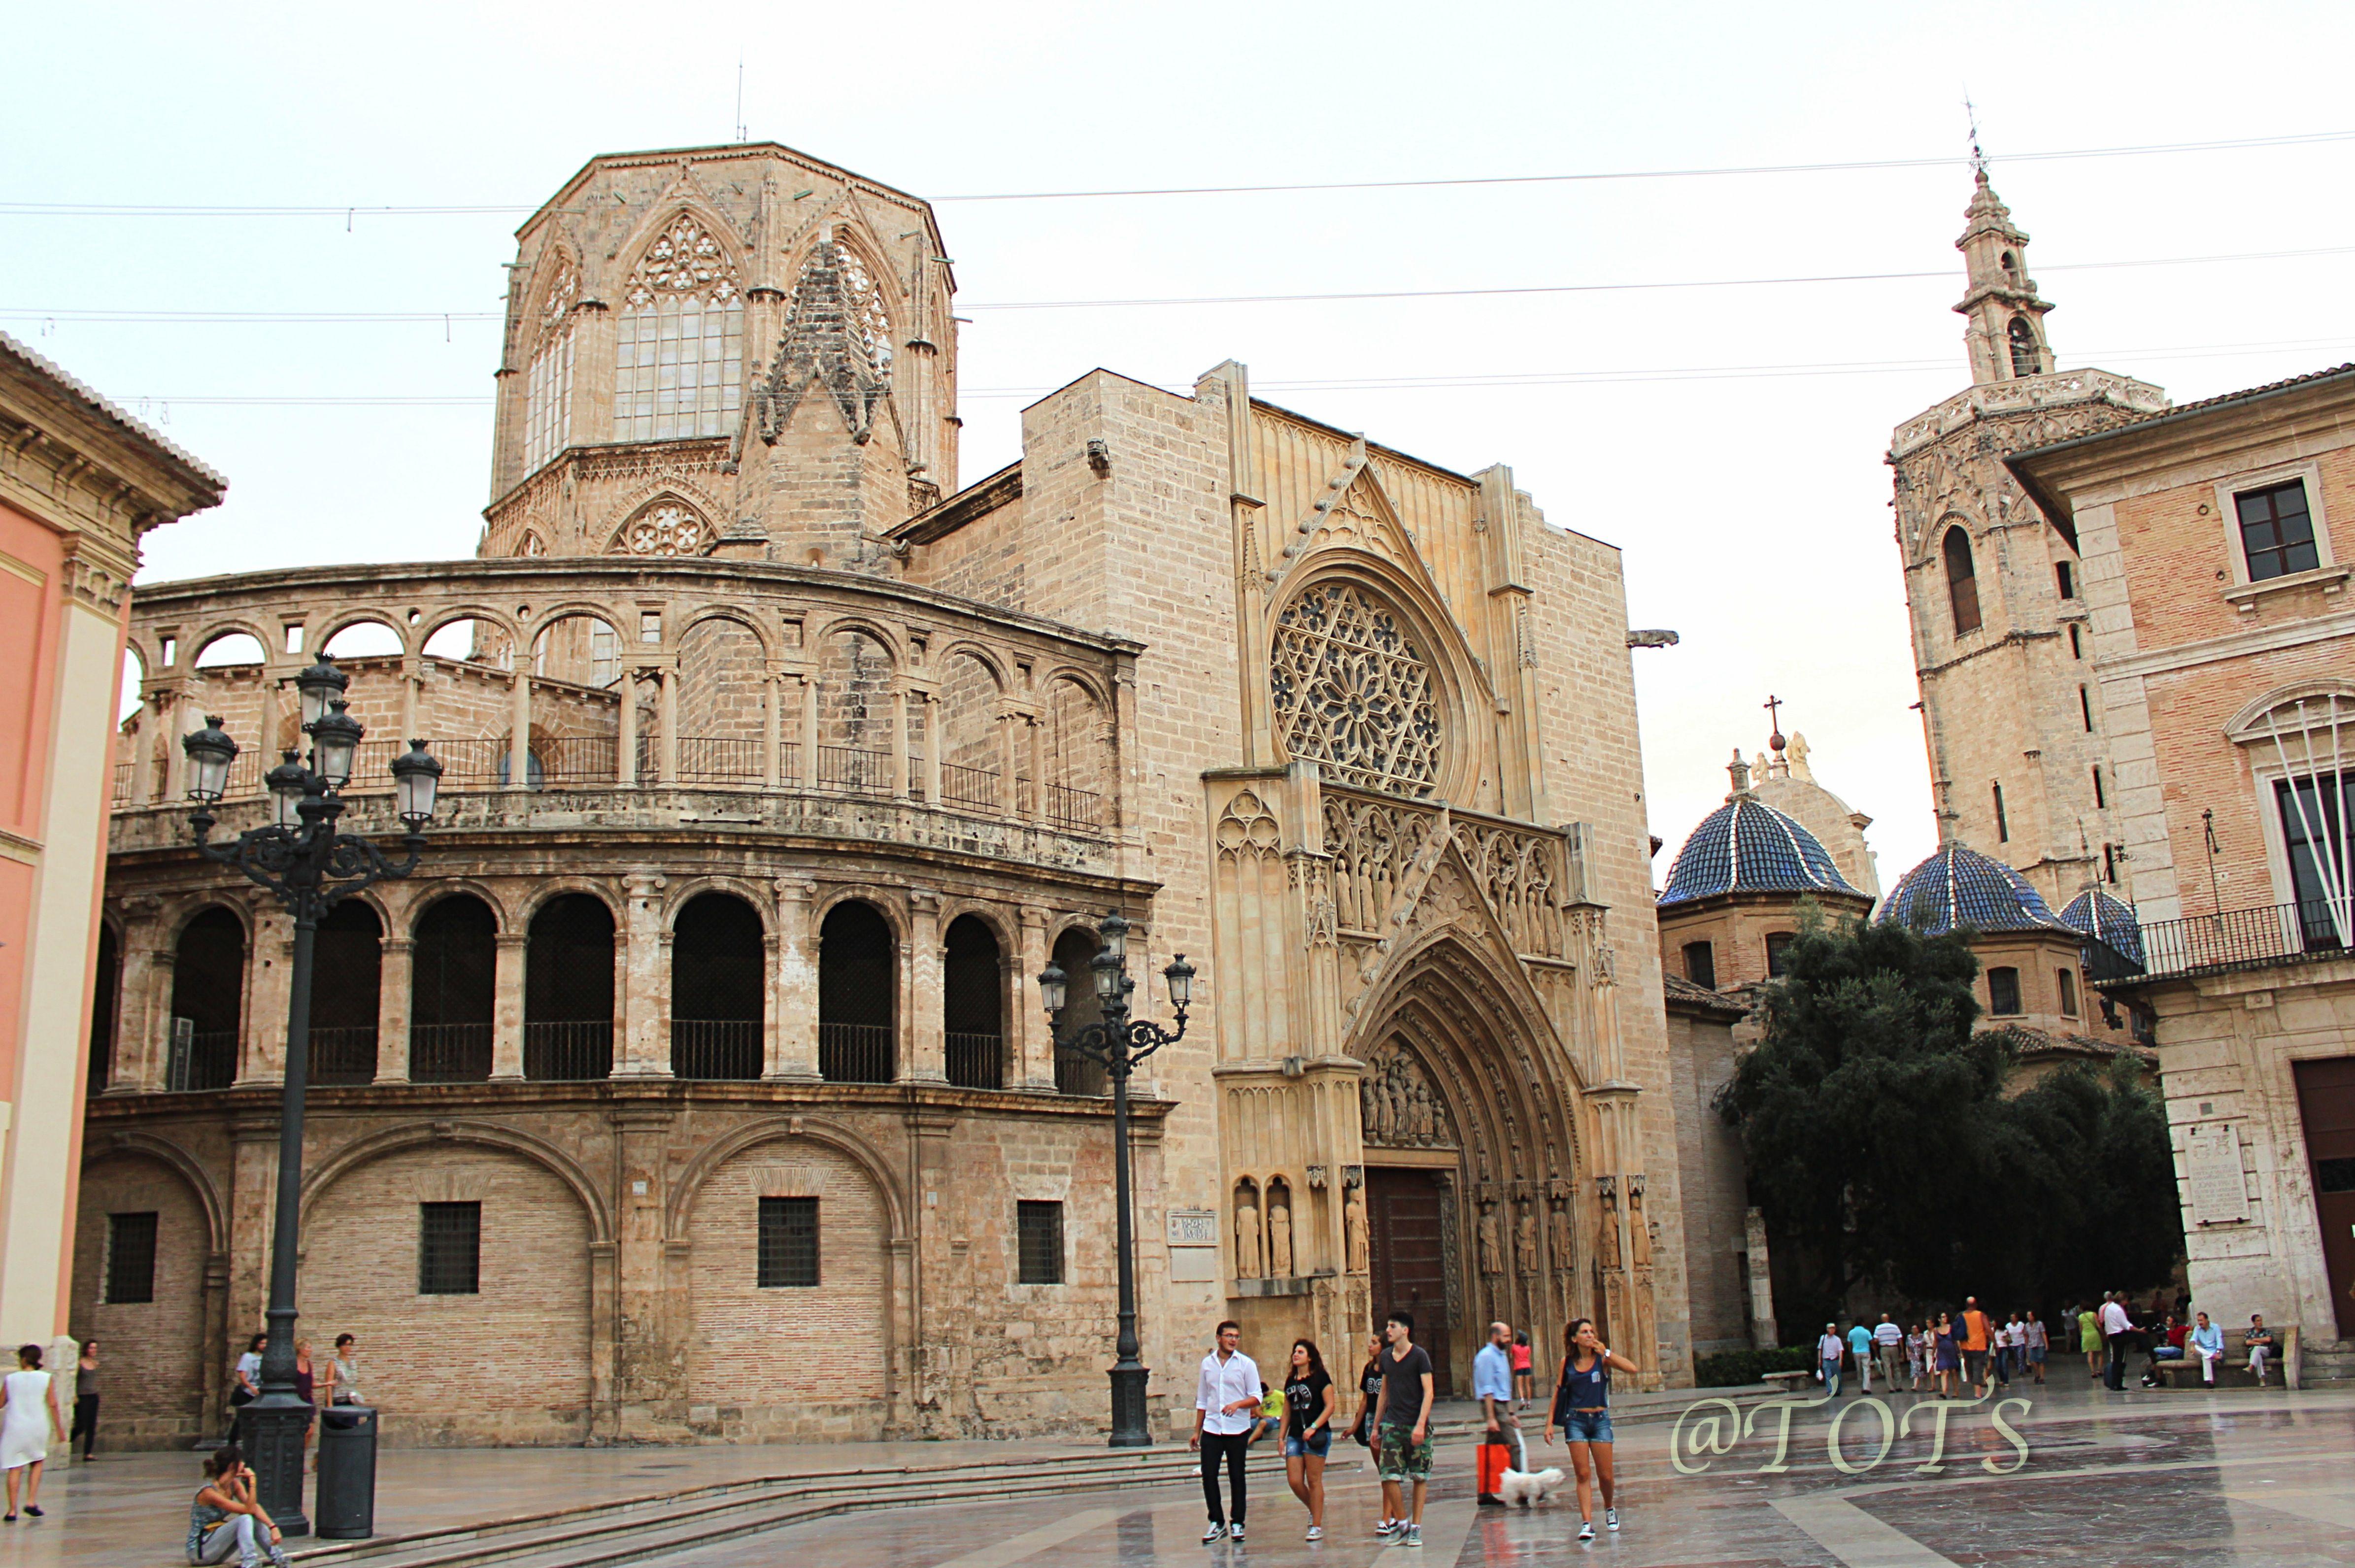 The Almoina Valencia Spain